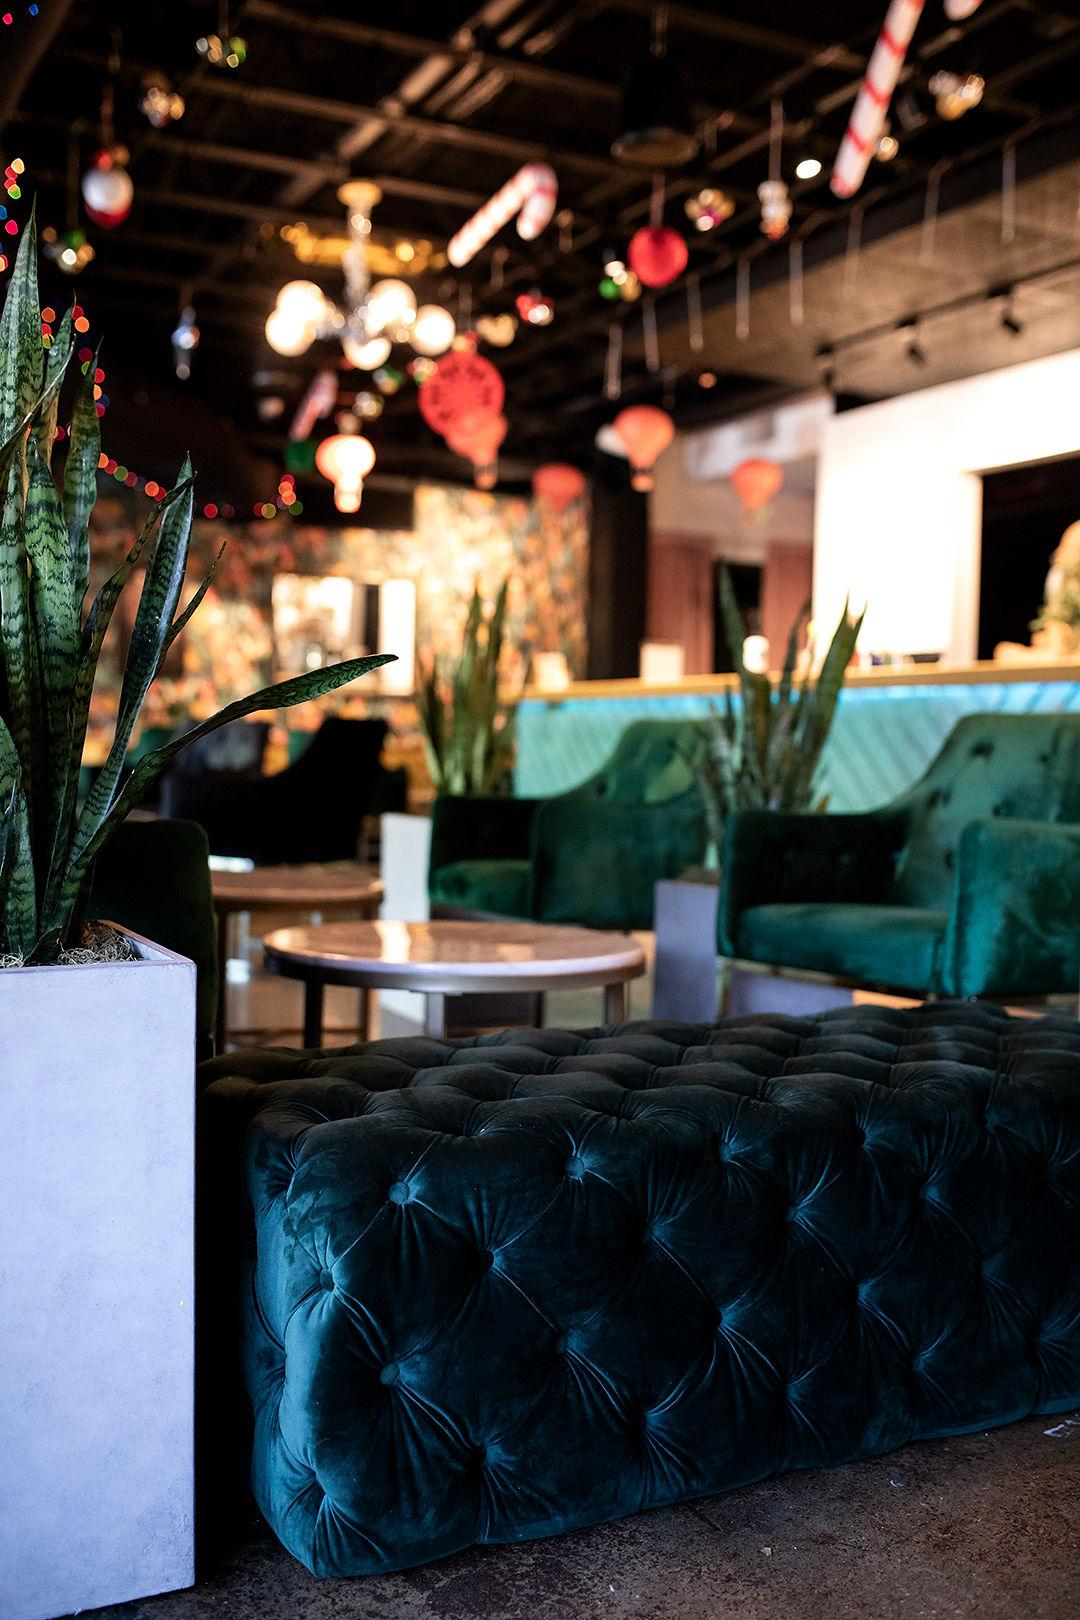 Killjoy Cocktail Bar Downtown Raleigh - November 2020 - Photos by Em